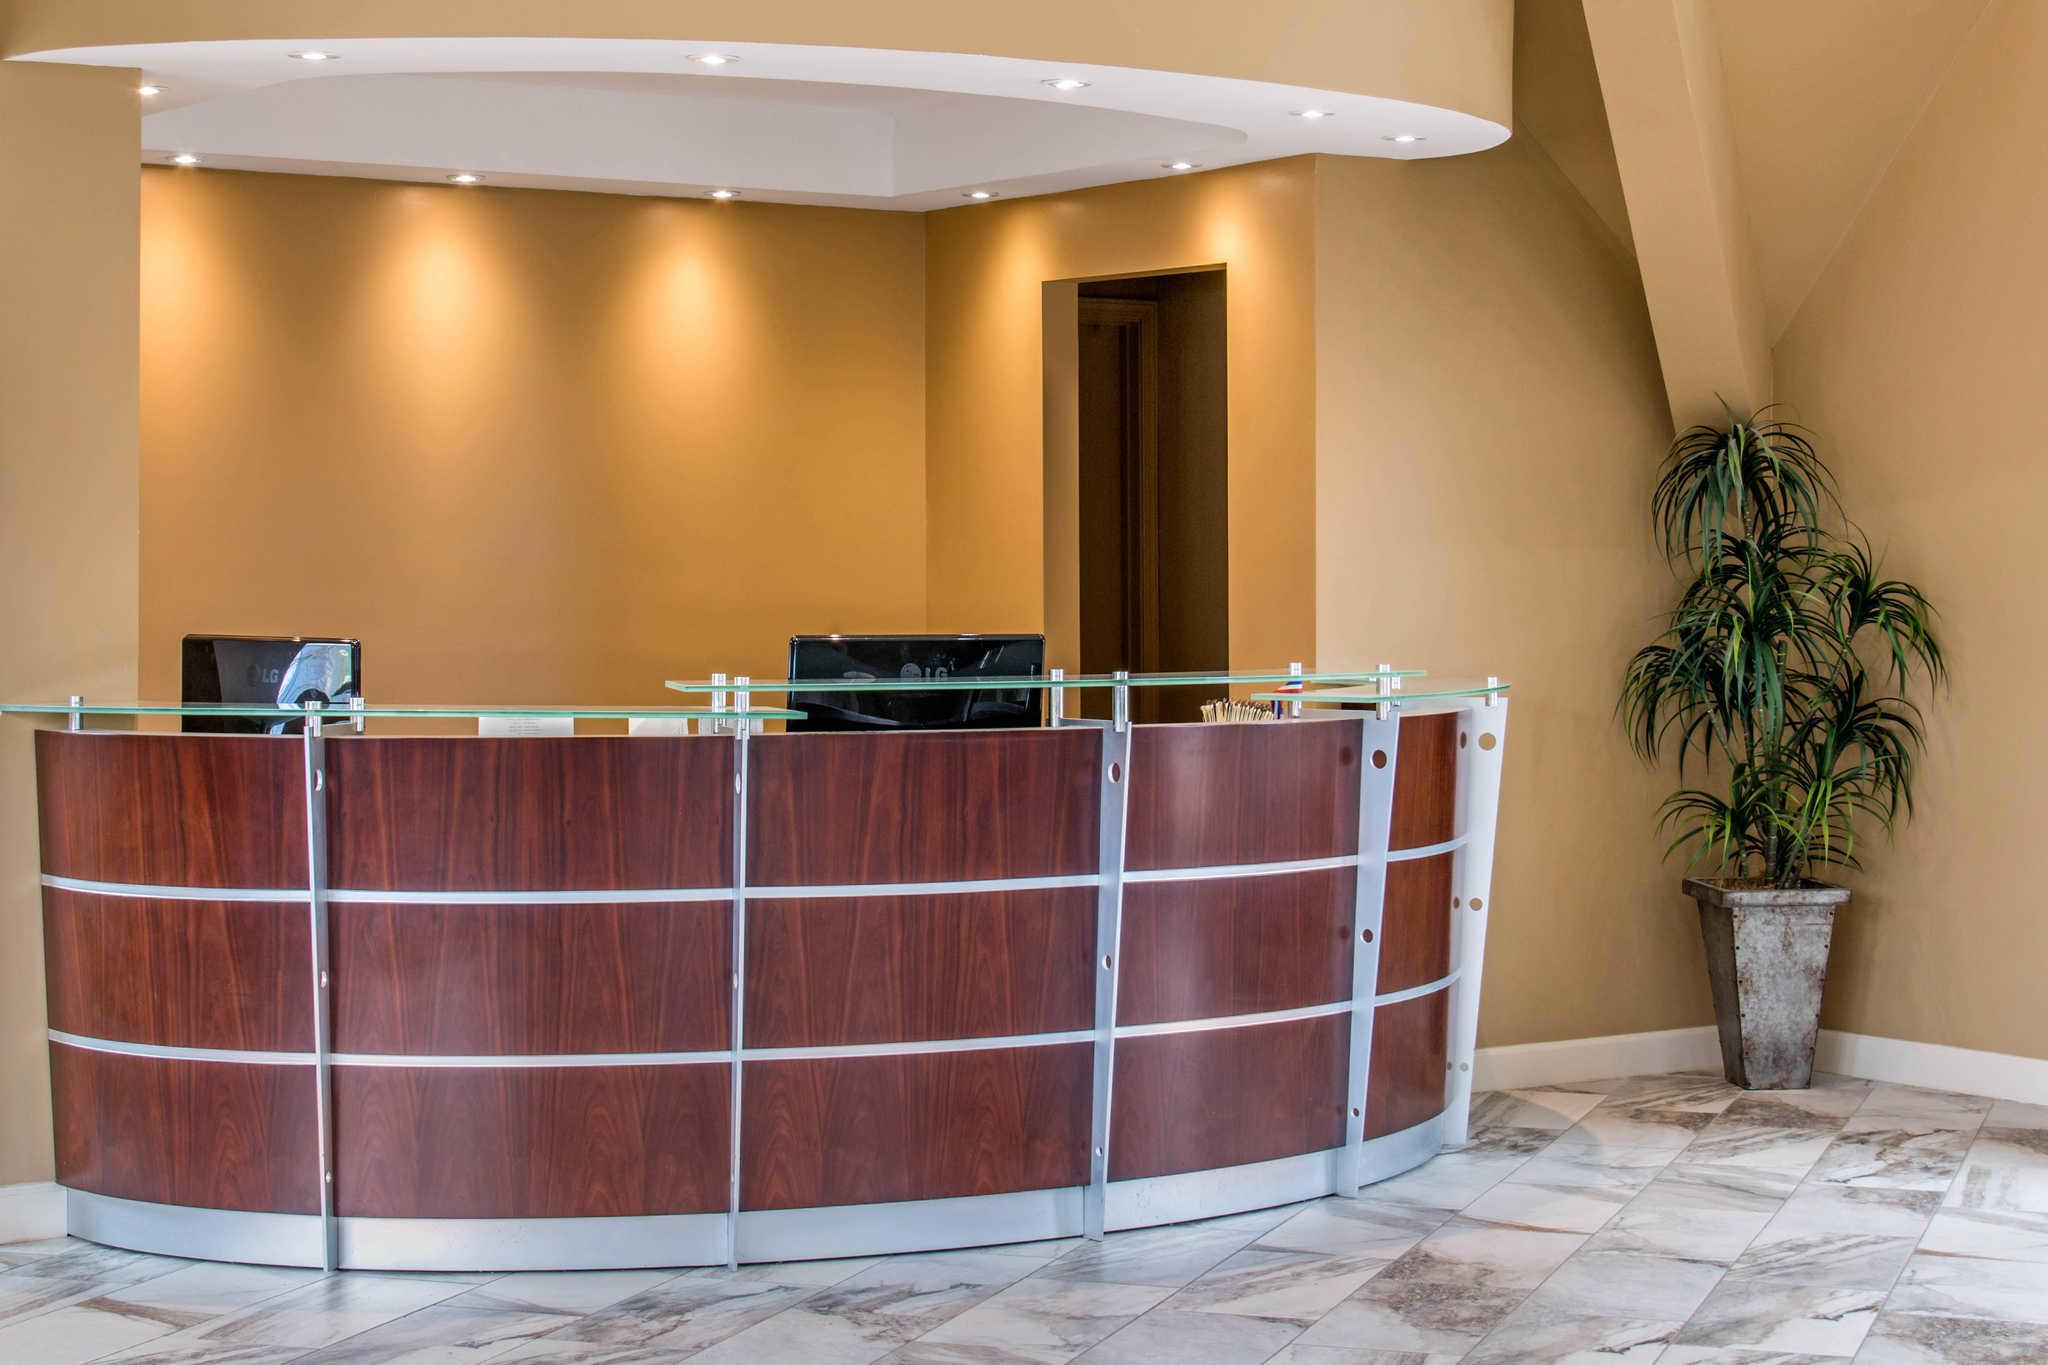 Econo Lodge Inn & Suites image 6